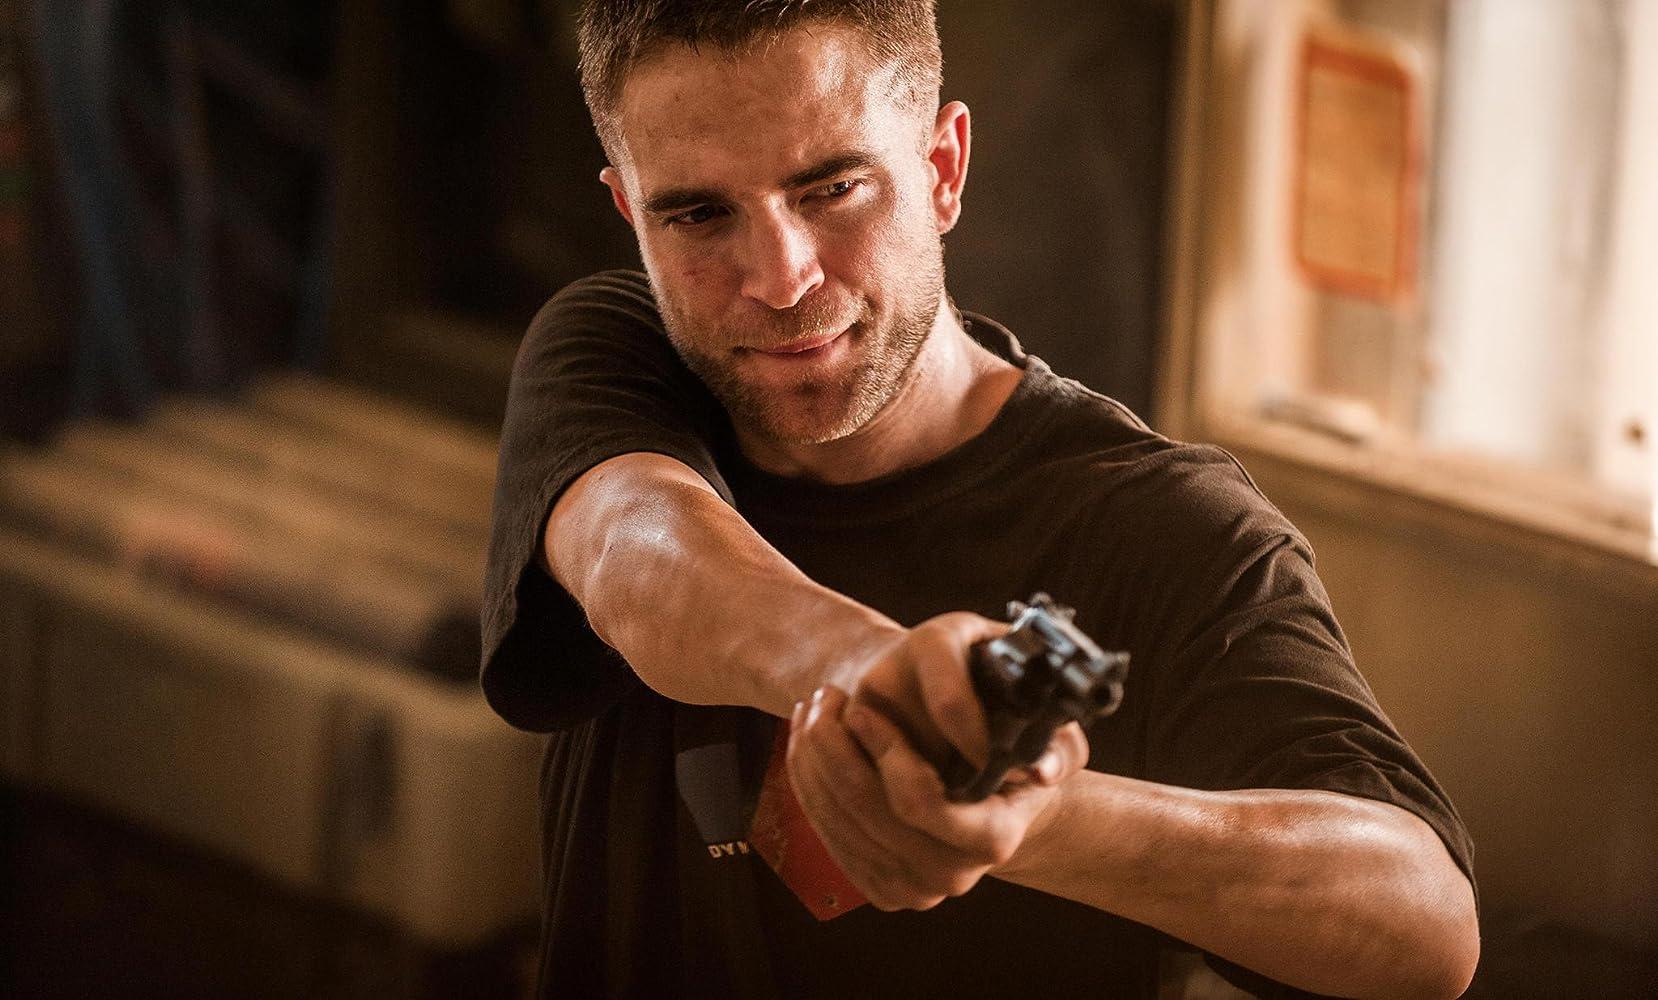 Robert Pattinson in The Rover (2014)